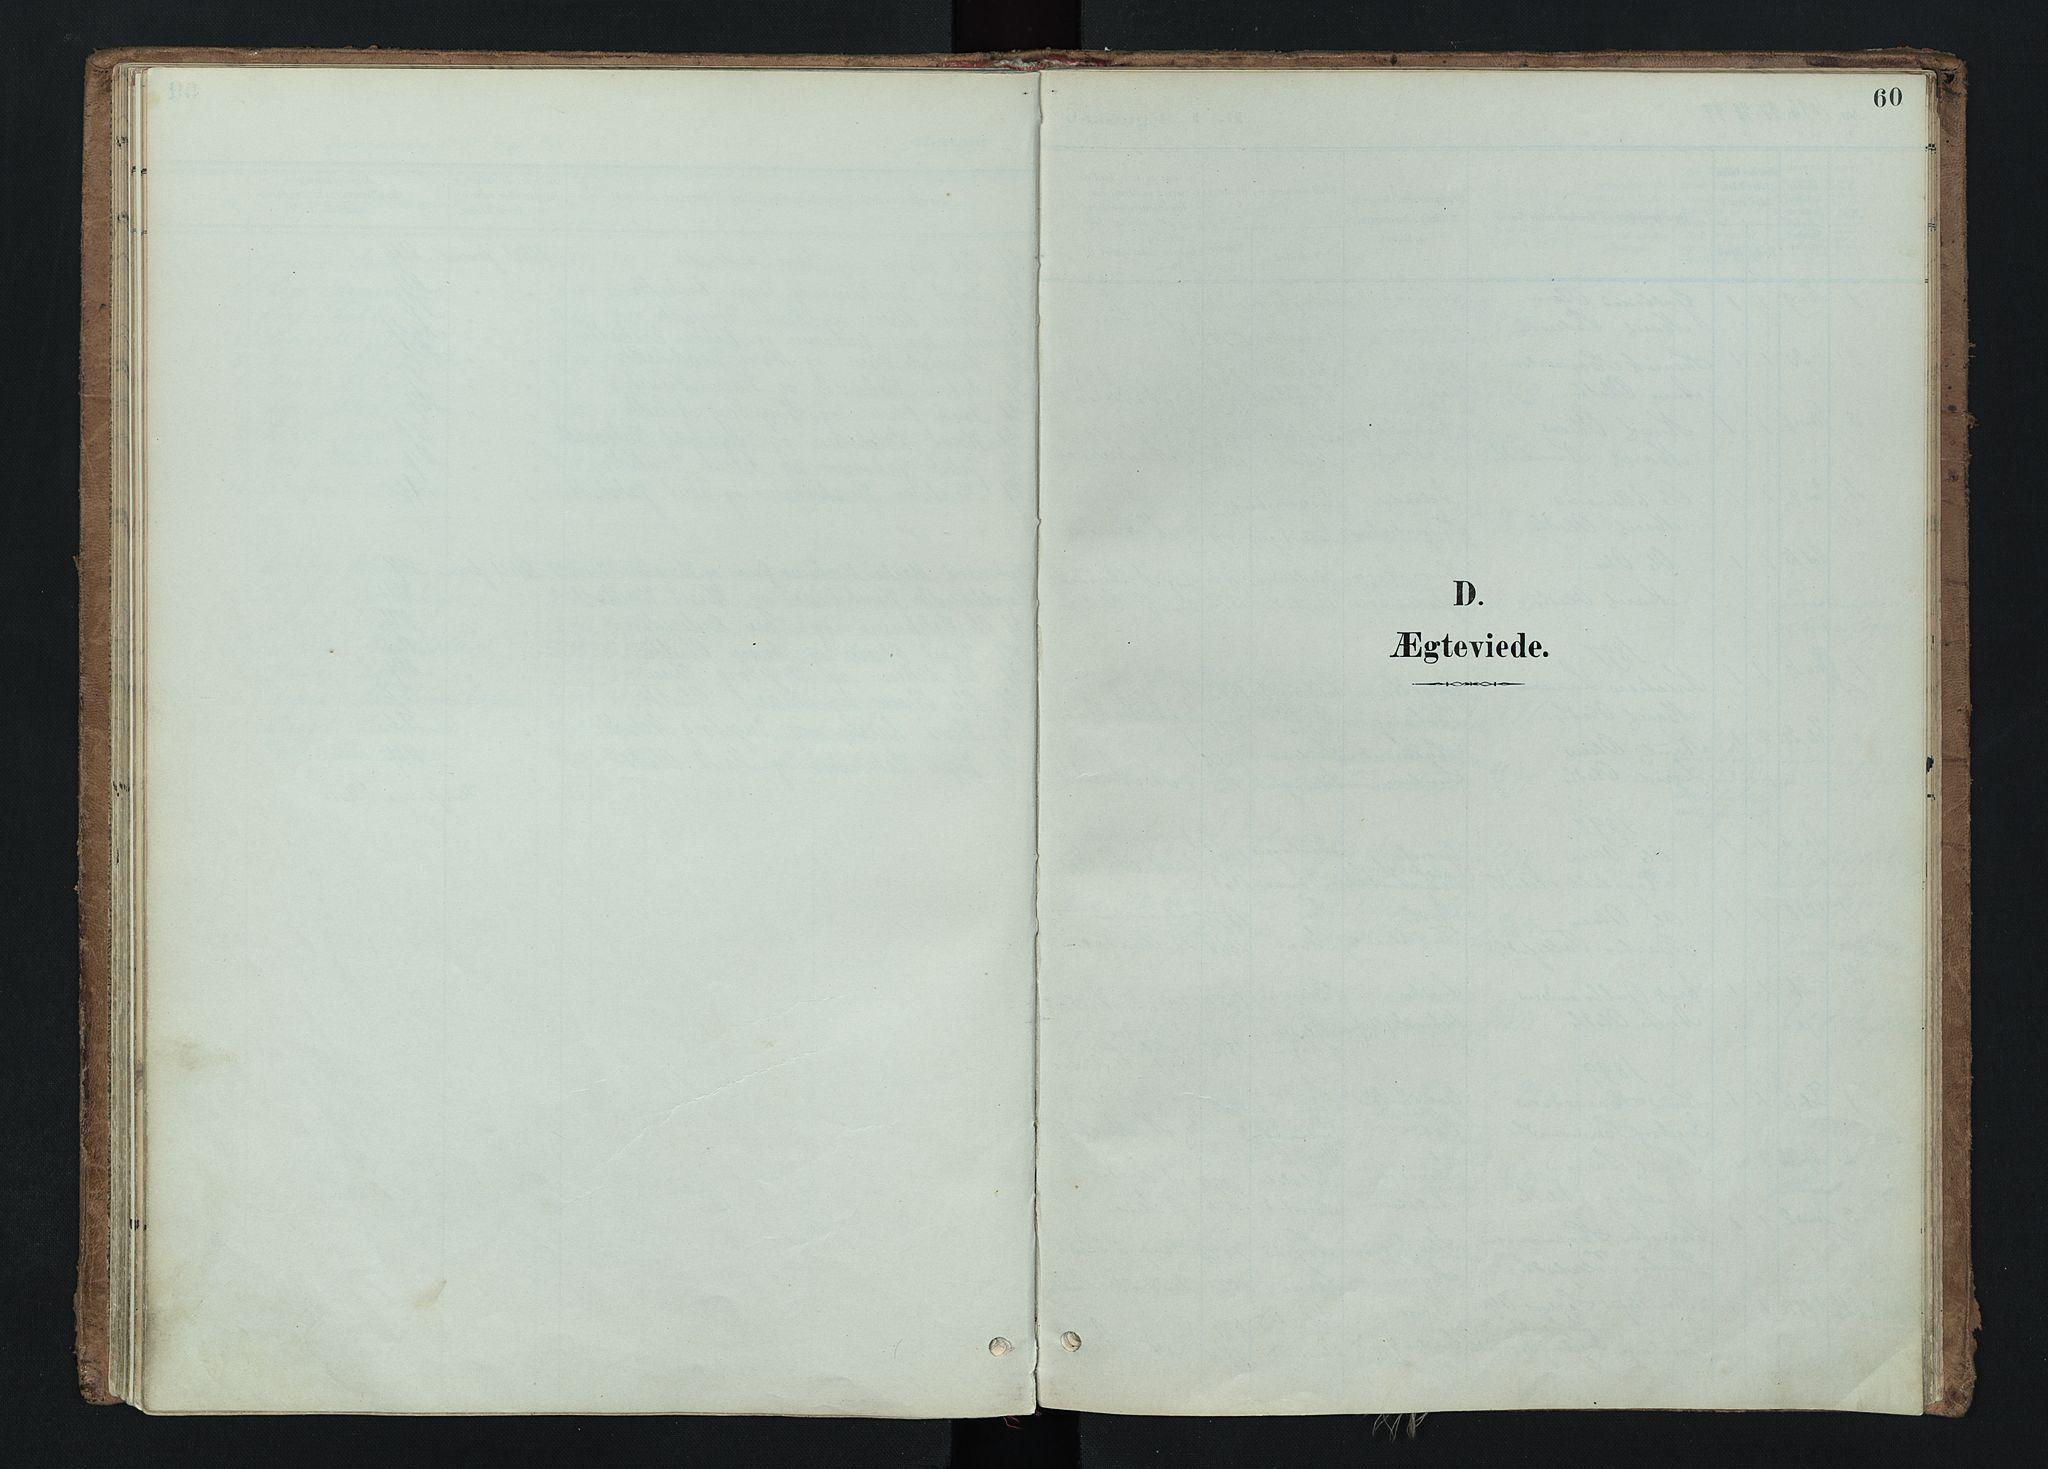 SAH, Nord-Aurdal prestekontor, Ministerialbok nr. 15, 1896-1914, s. 60